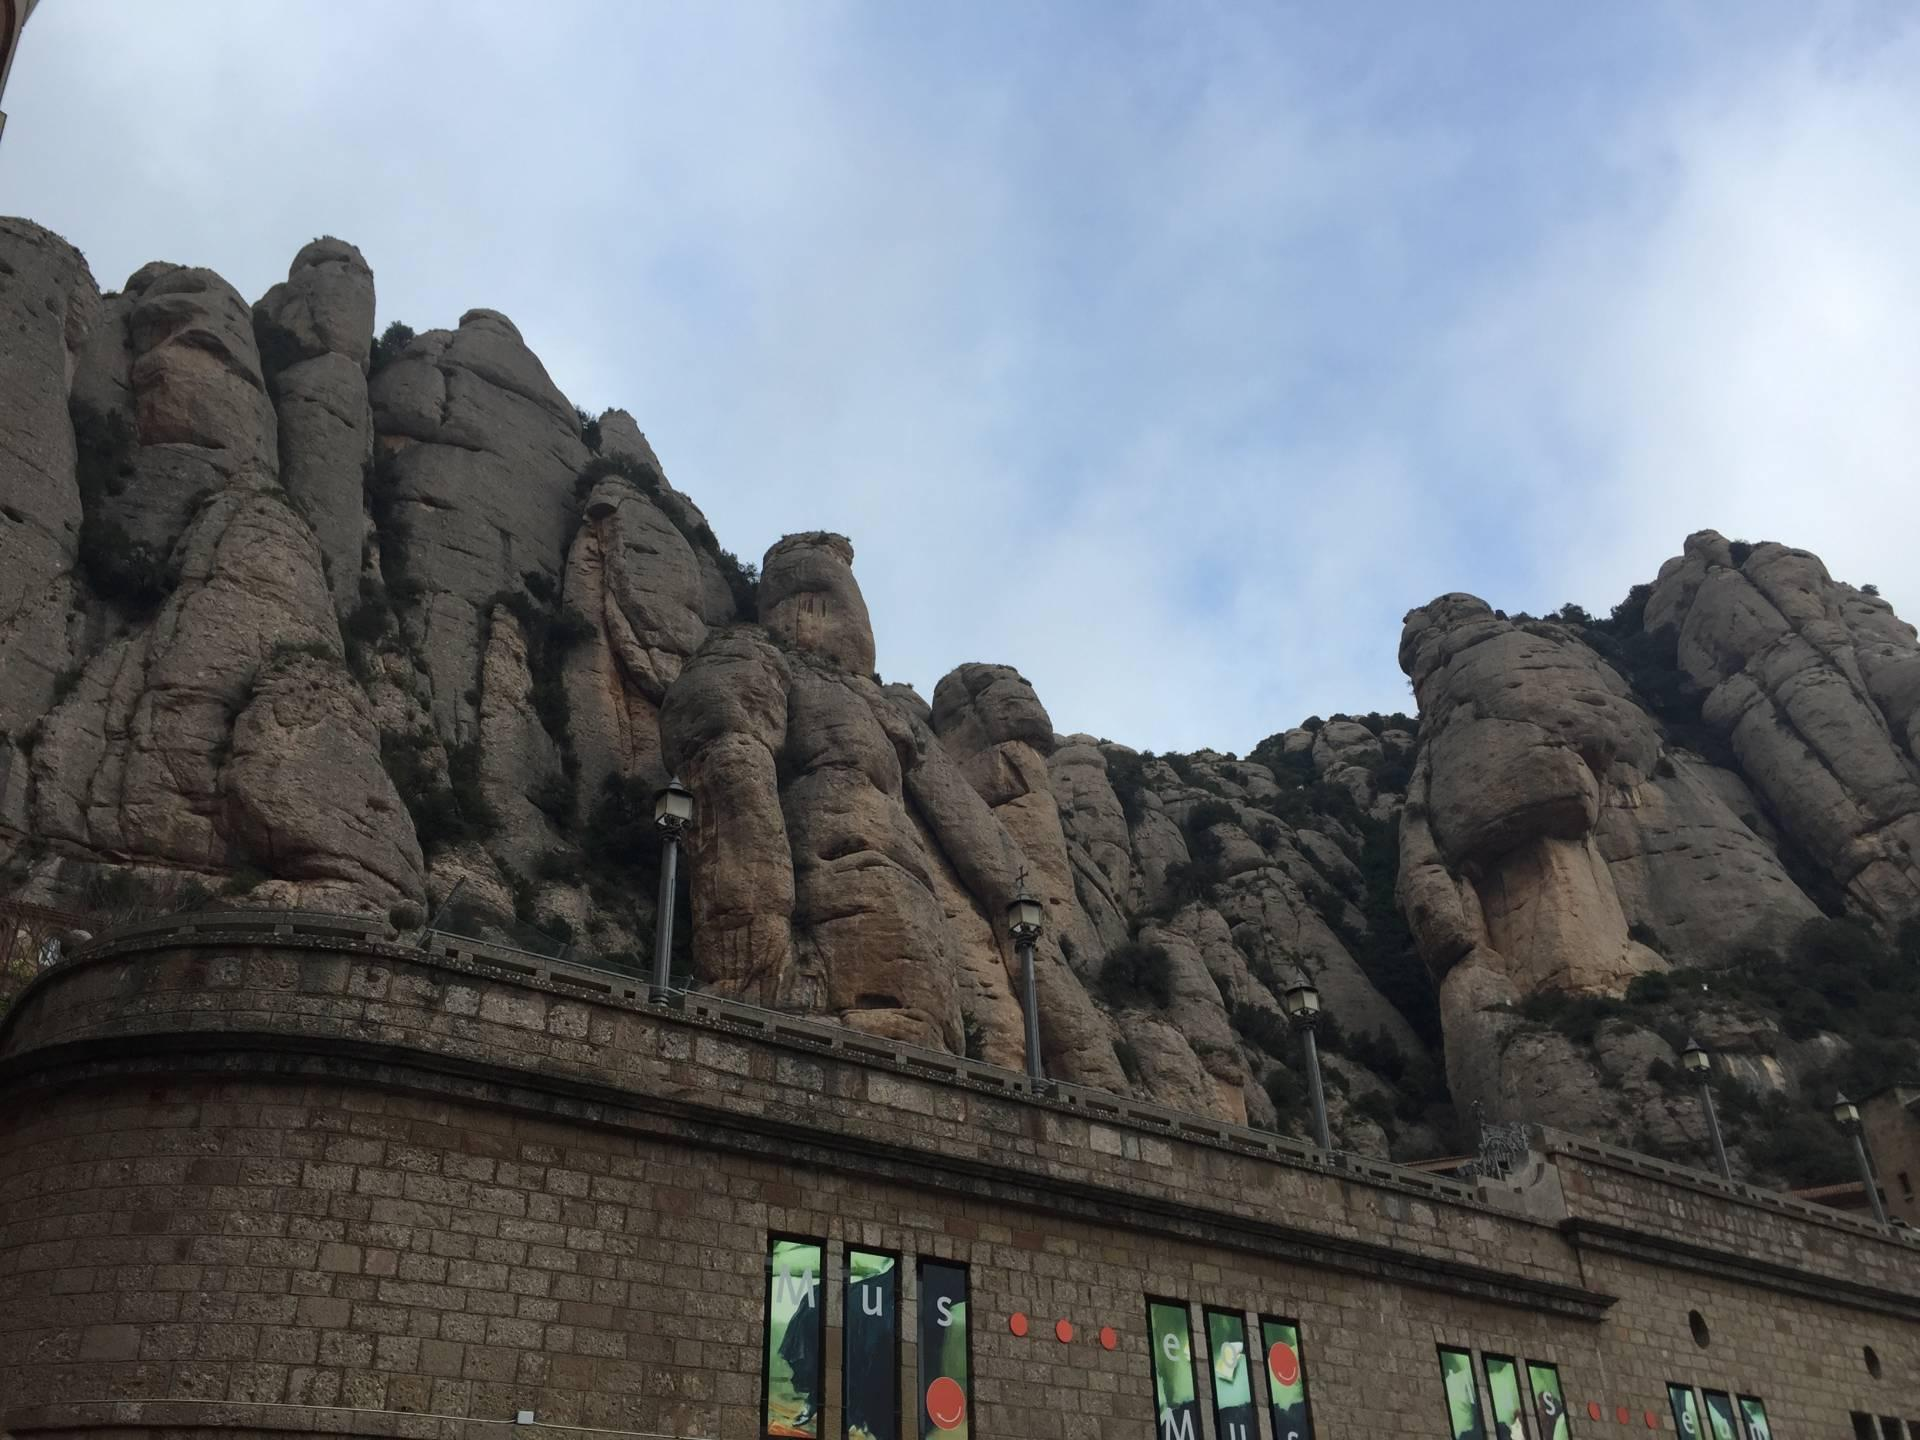 Serrated rocks of Montserrat